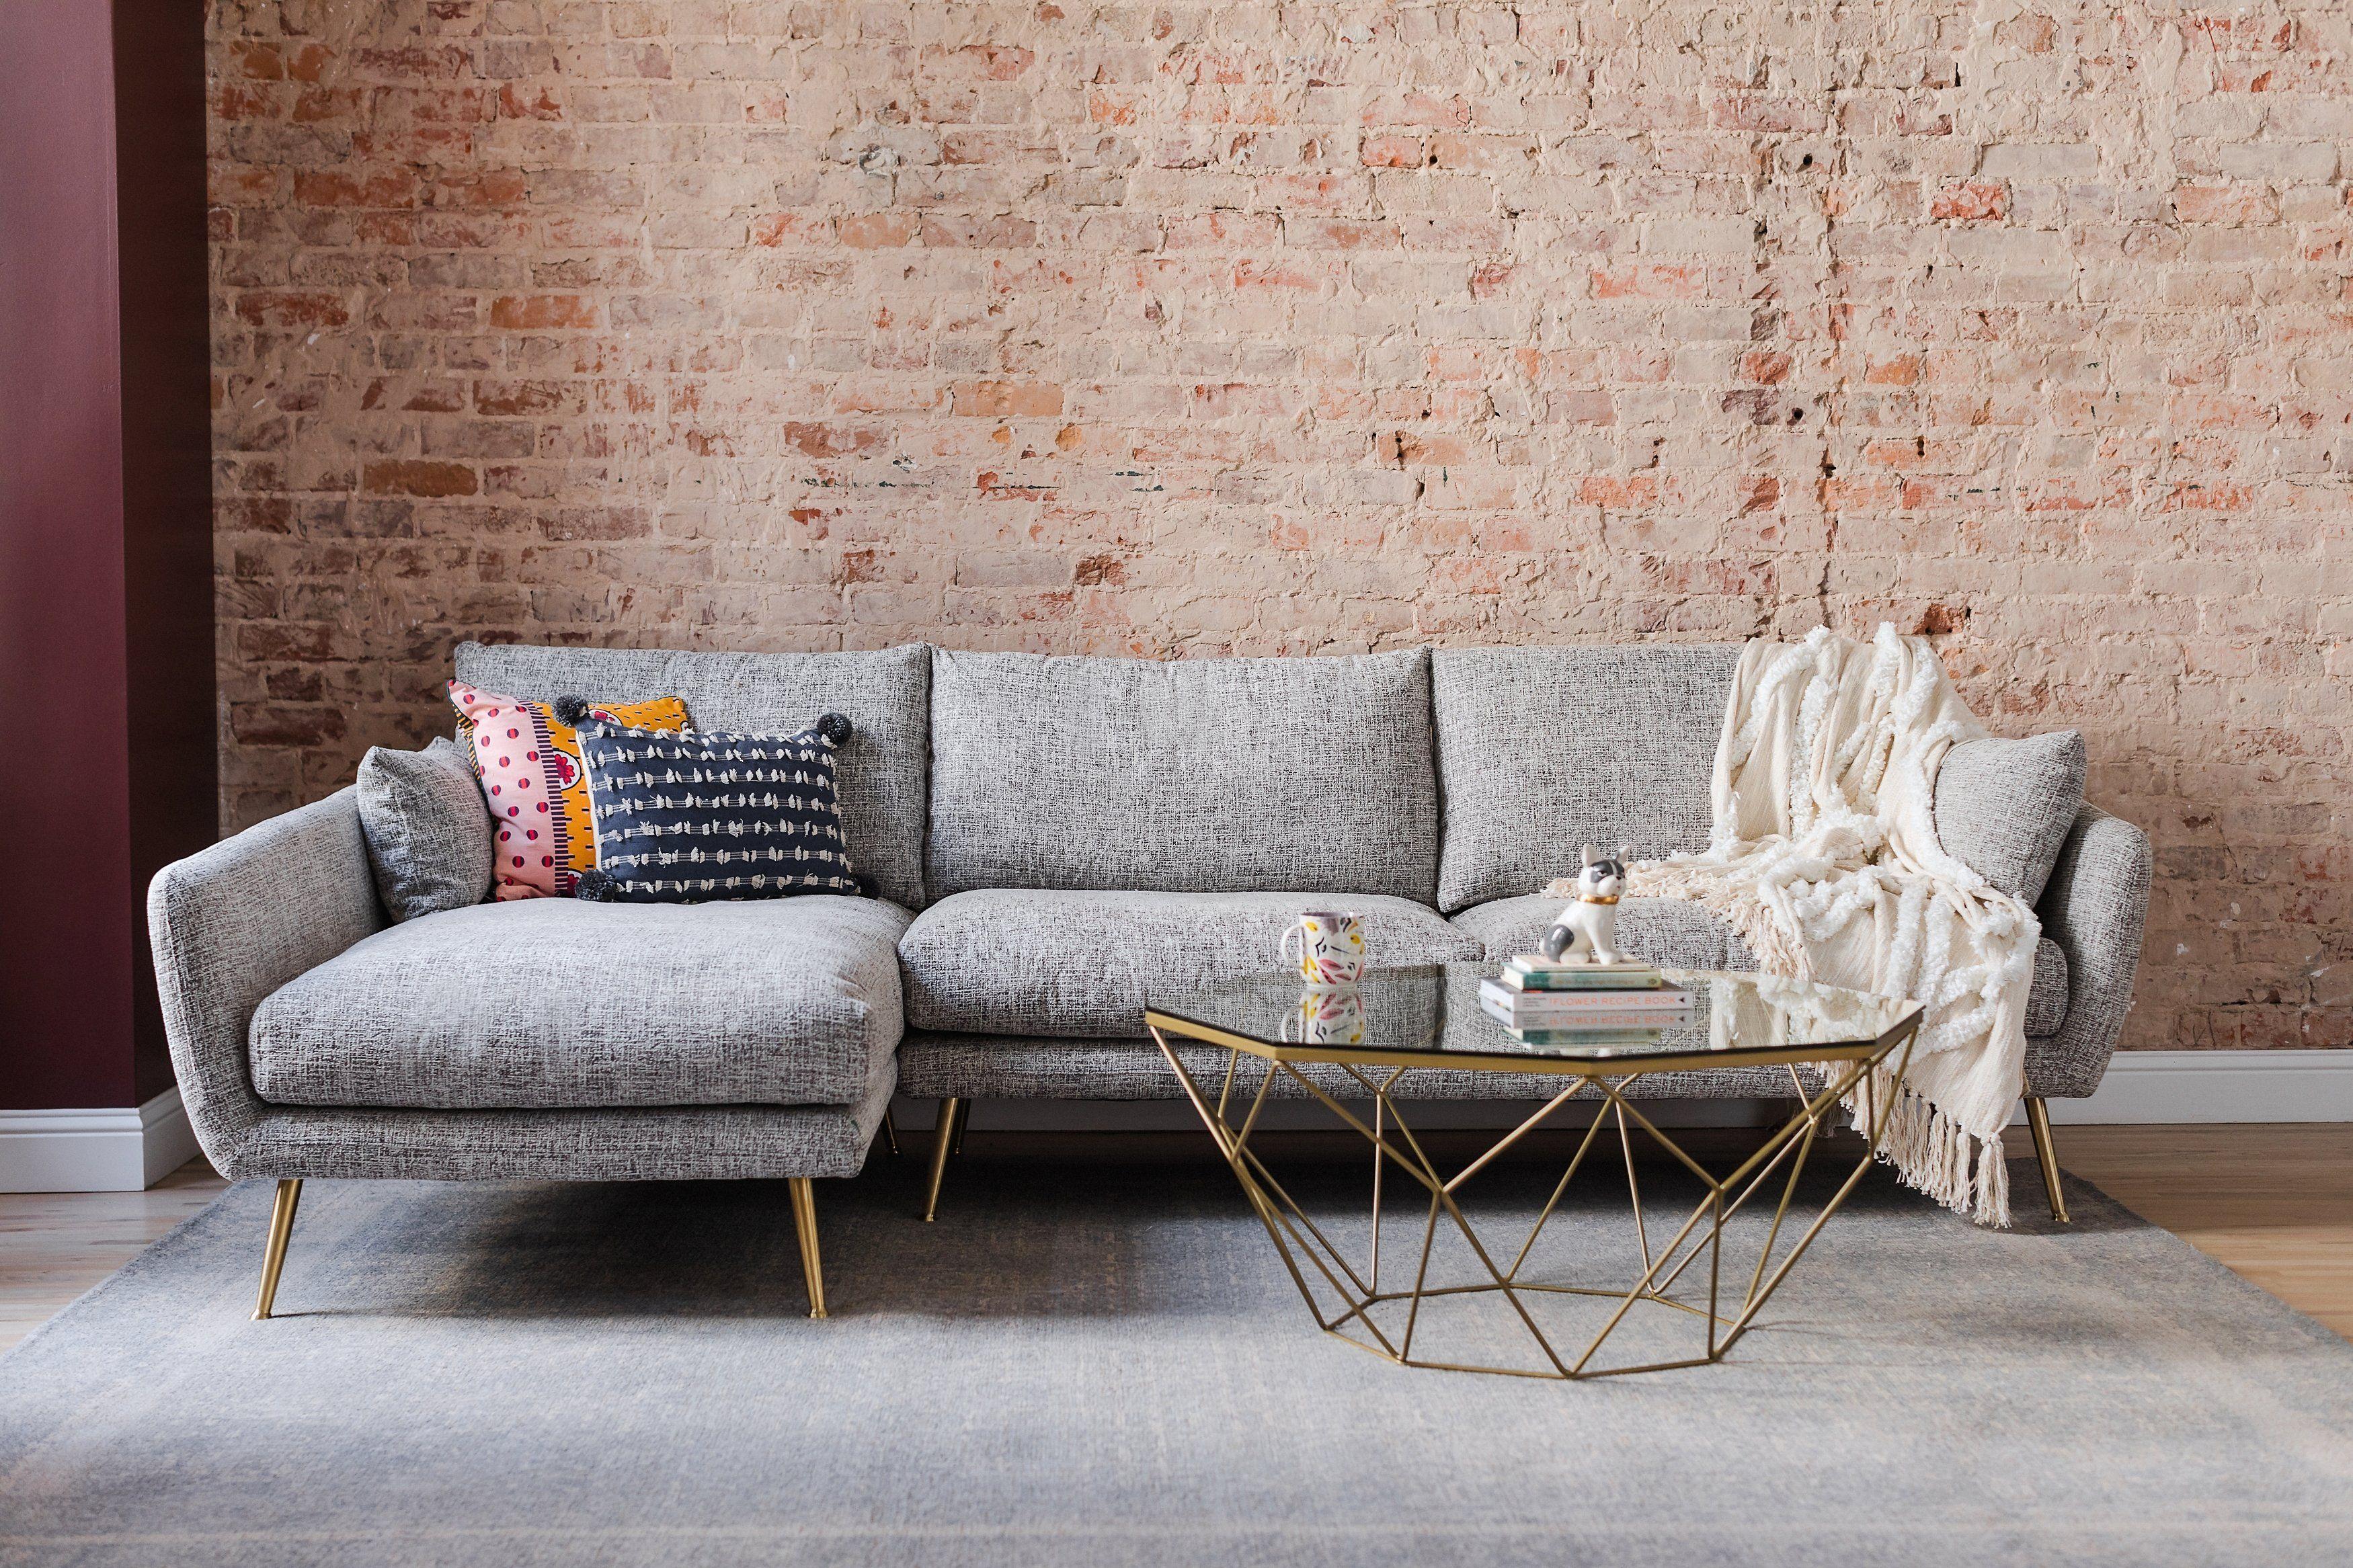 Harlow Sectional Sofa Edloe Finch Furniture Co Modern Sectional Sectional Sofa Mid Century Modern Living Room